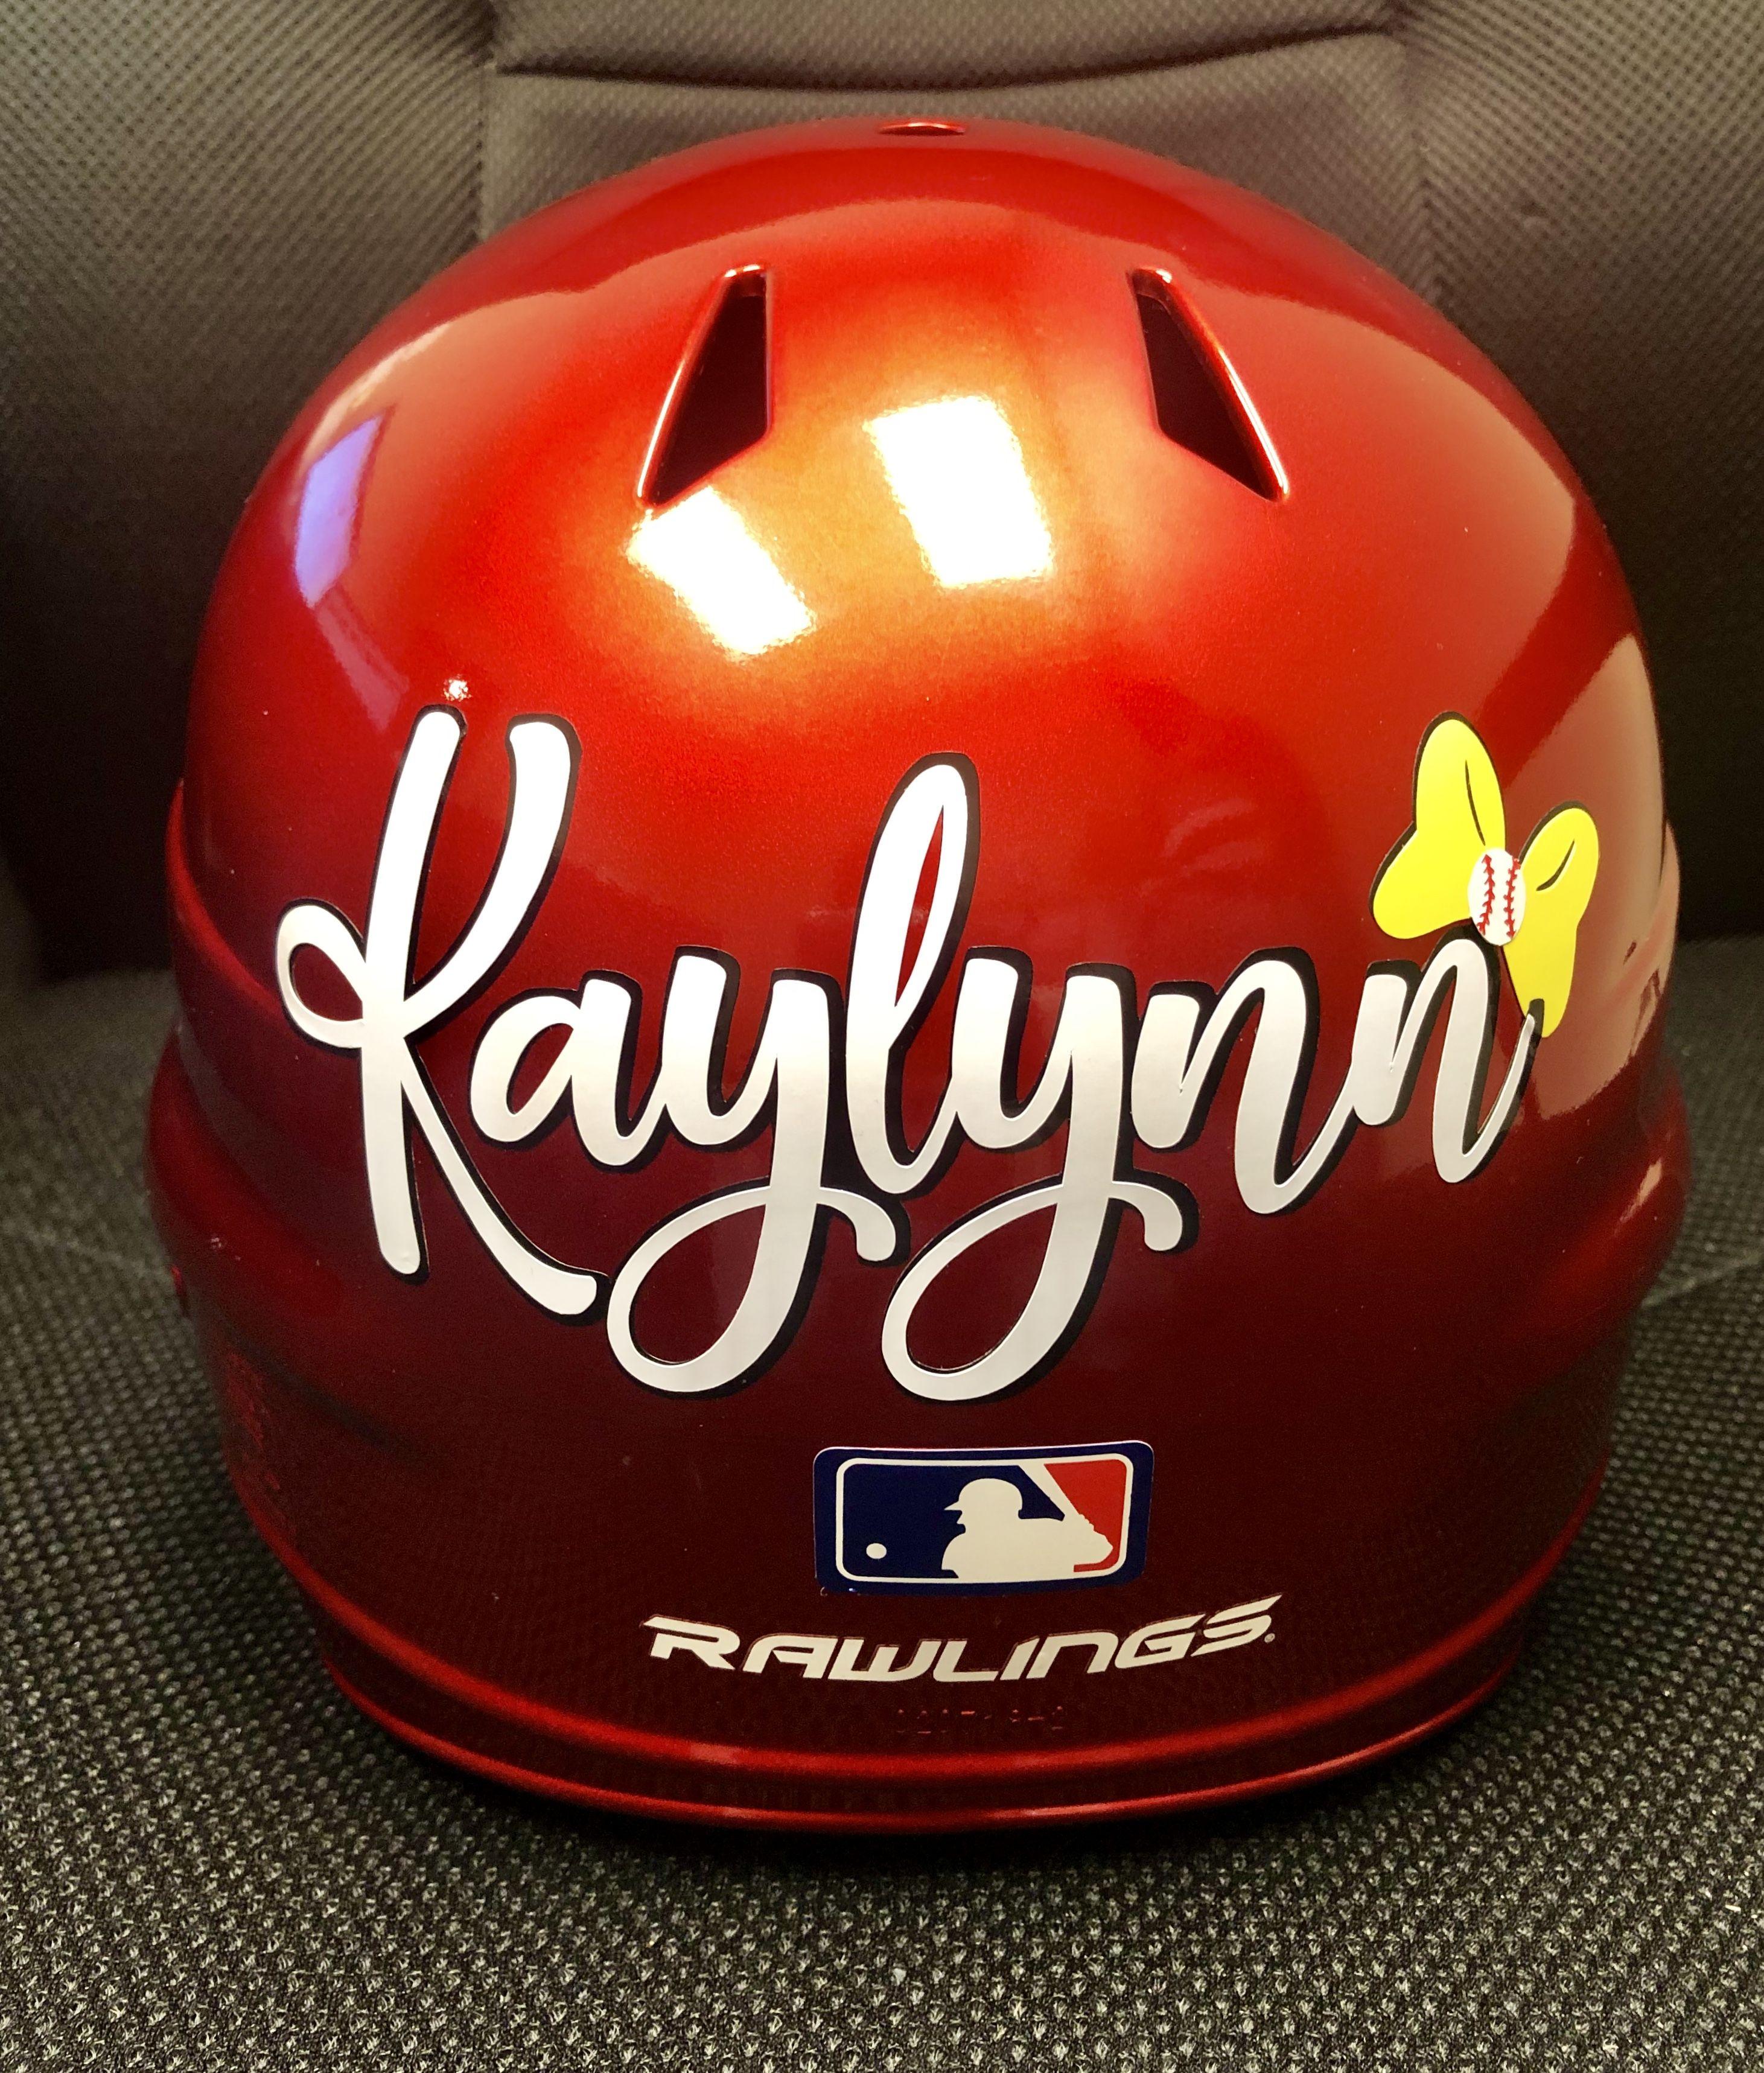 Baseball helmet decal  tball helmet decal  decal  tee ball helmet decal  baseball decal  softball decal  helmet decal  helmet  decal